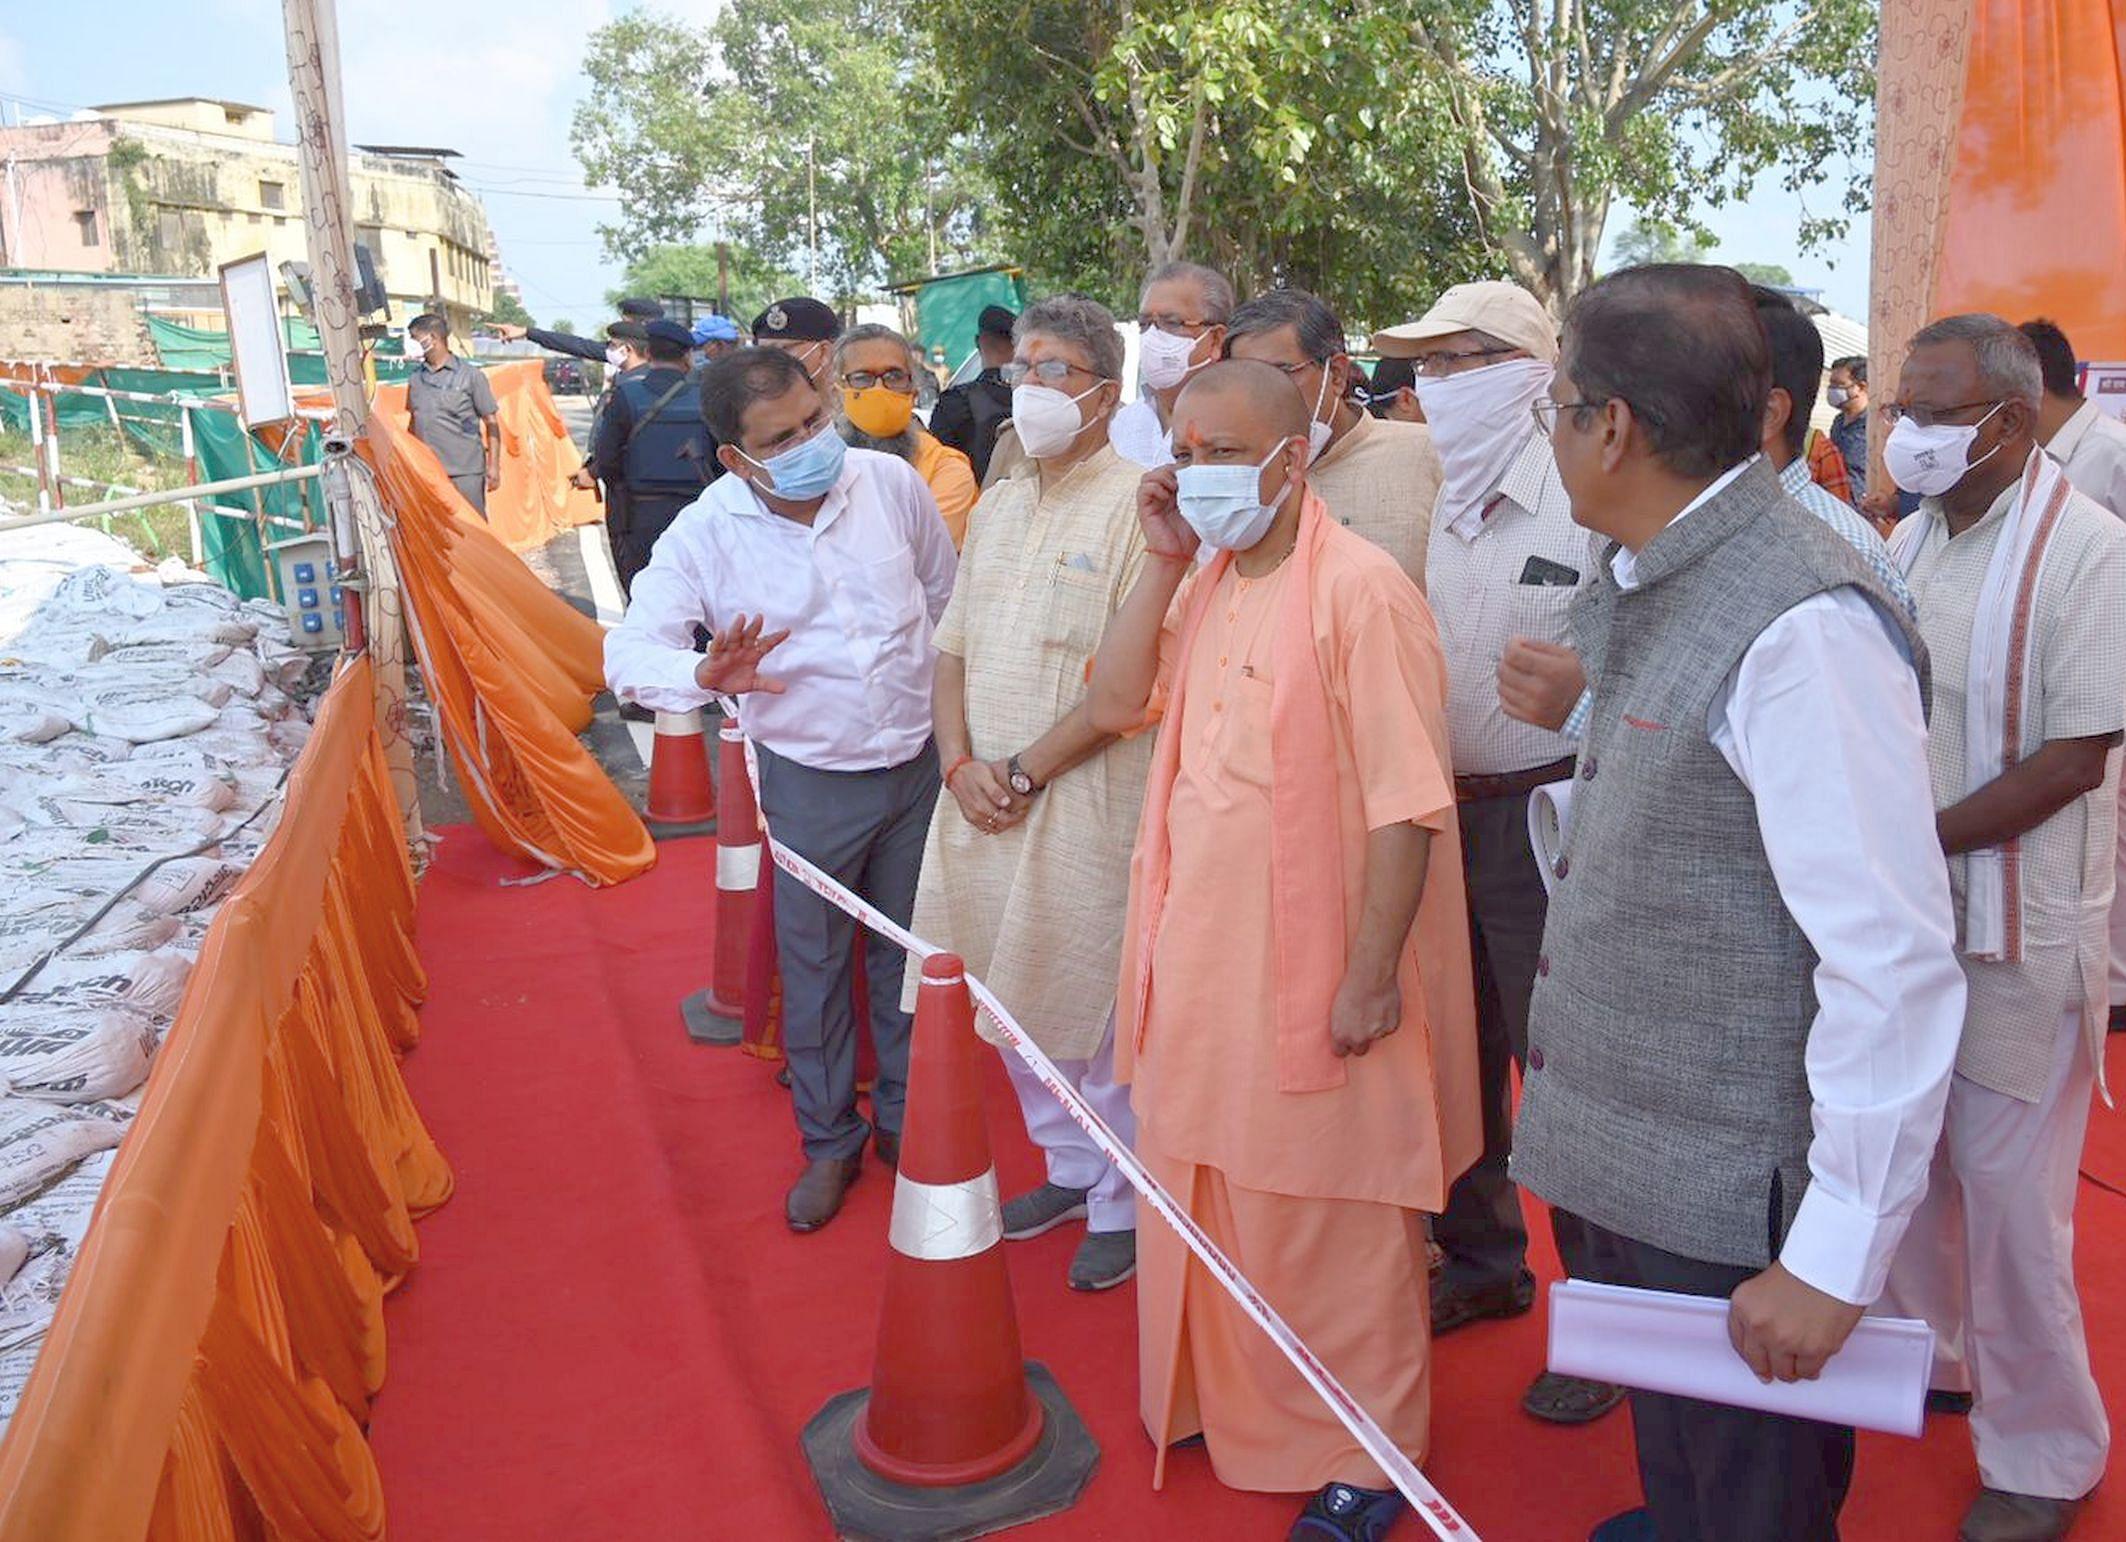 अयोध्या-रविवार को राममंदिर की प्रगति देखते मुख्यमंत्री योगीआदित्यनाथ